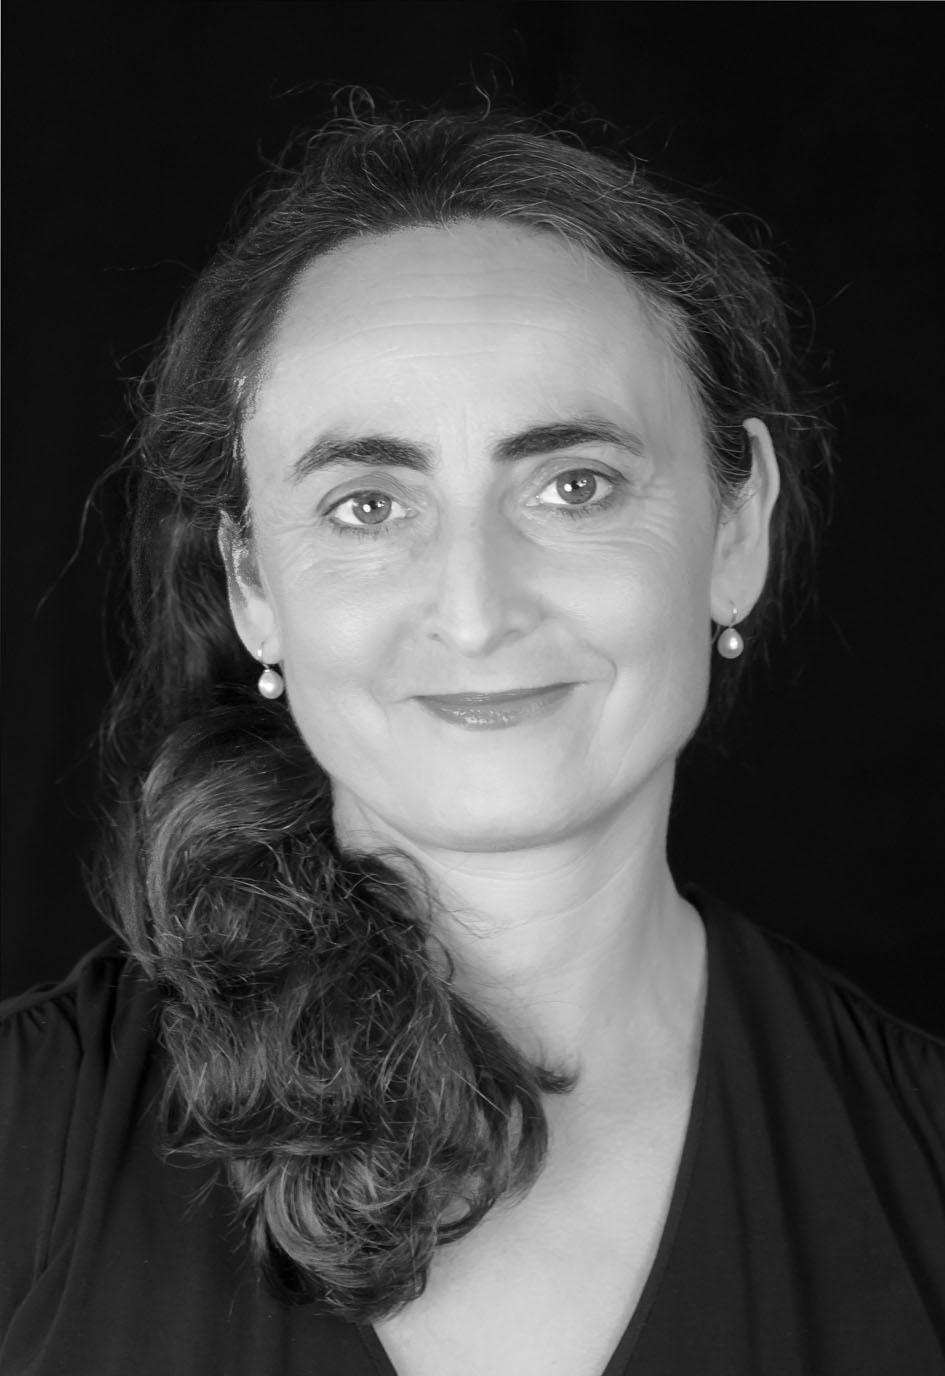 Bettina Beatrice Kulbe